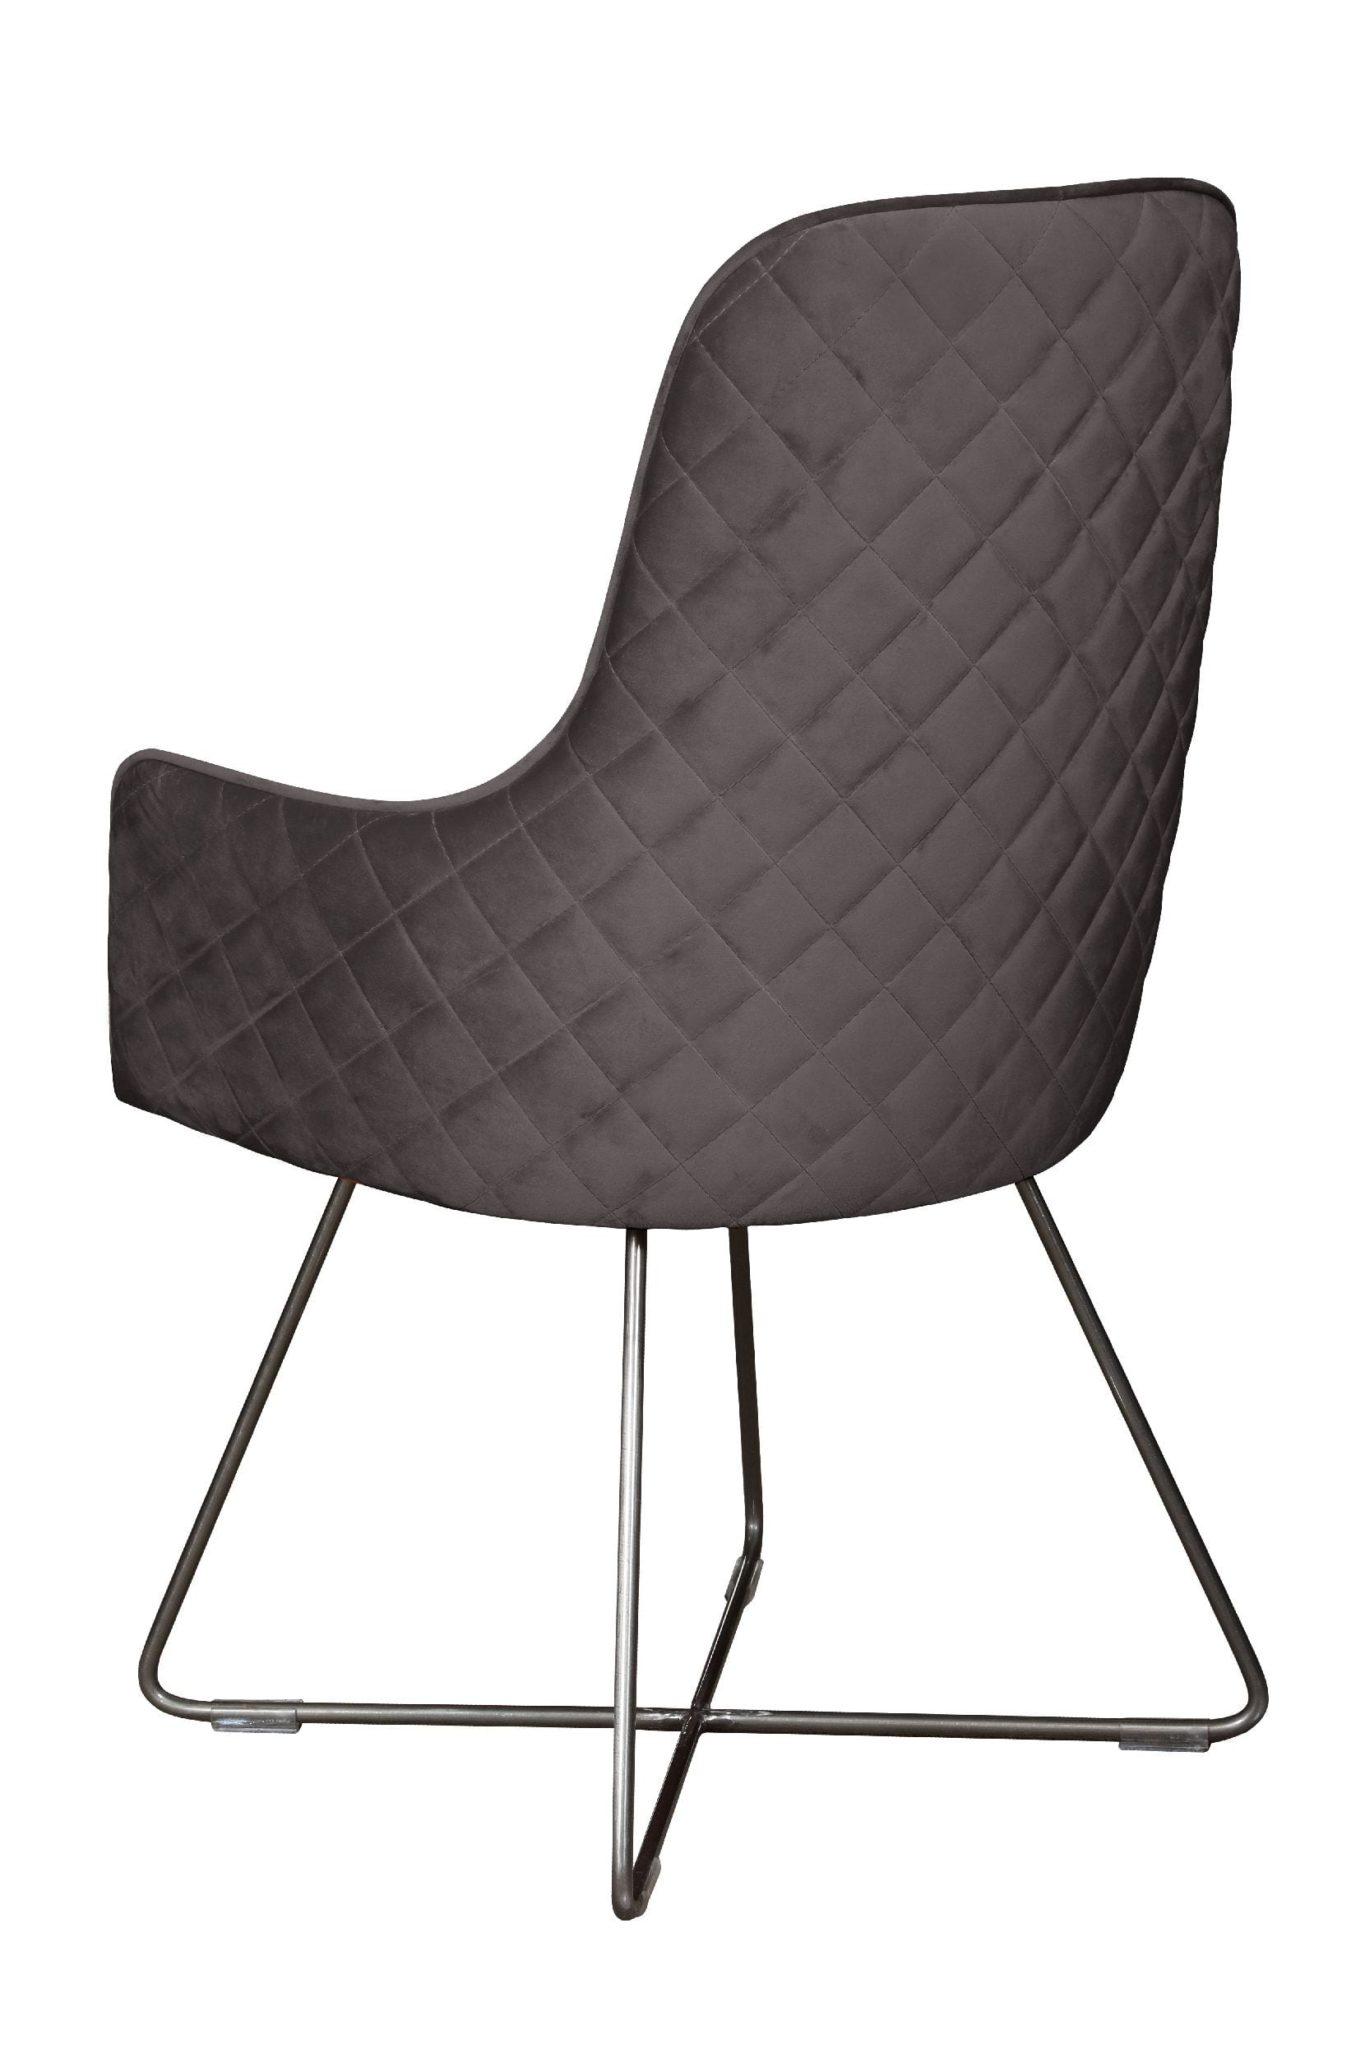 Utah dining chair plush steel